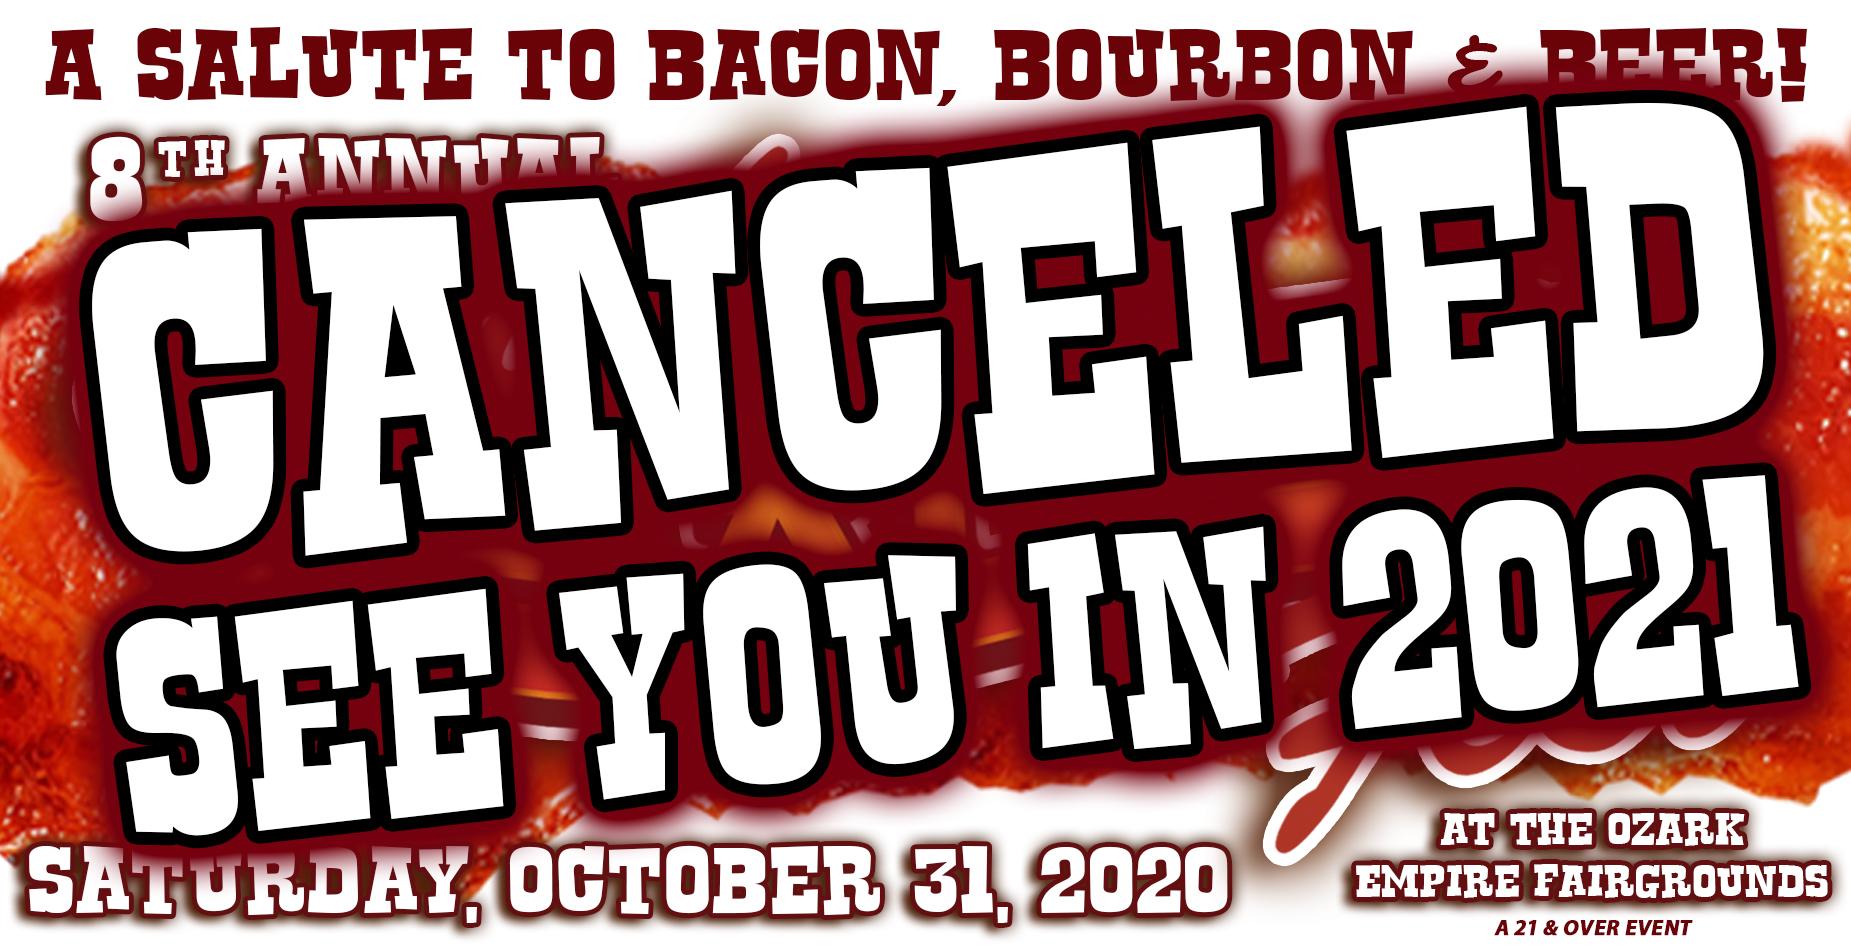 facebook event header 2020 Bacon Fest canceled